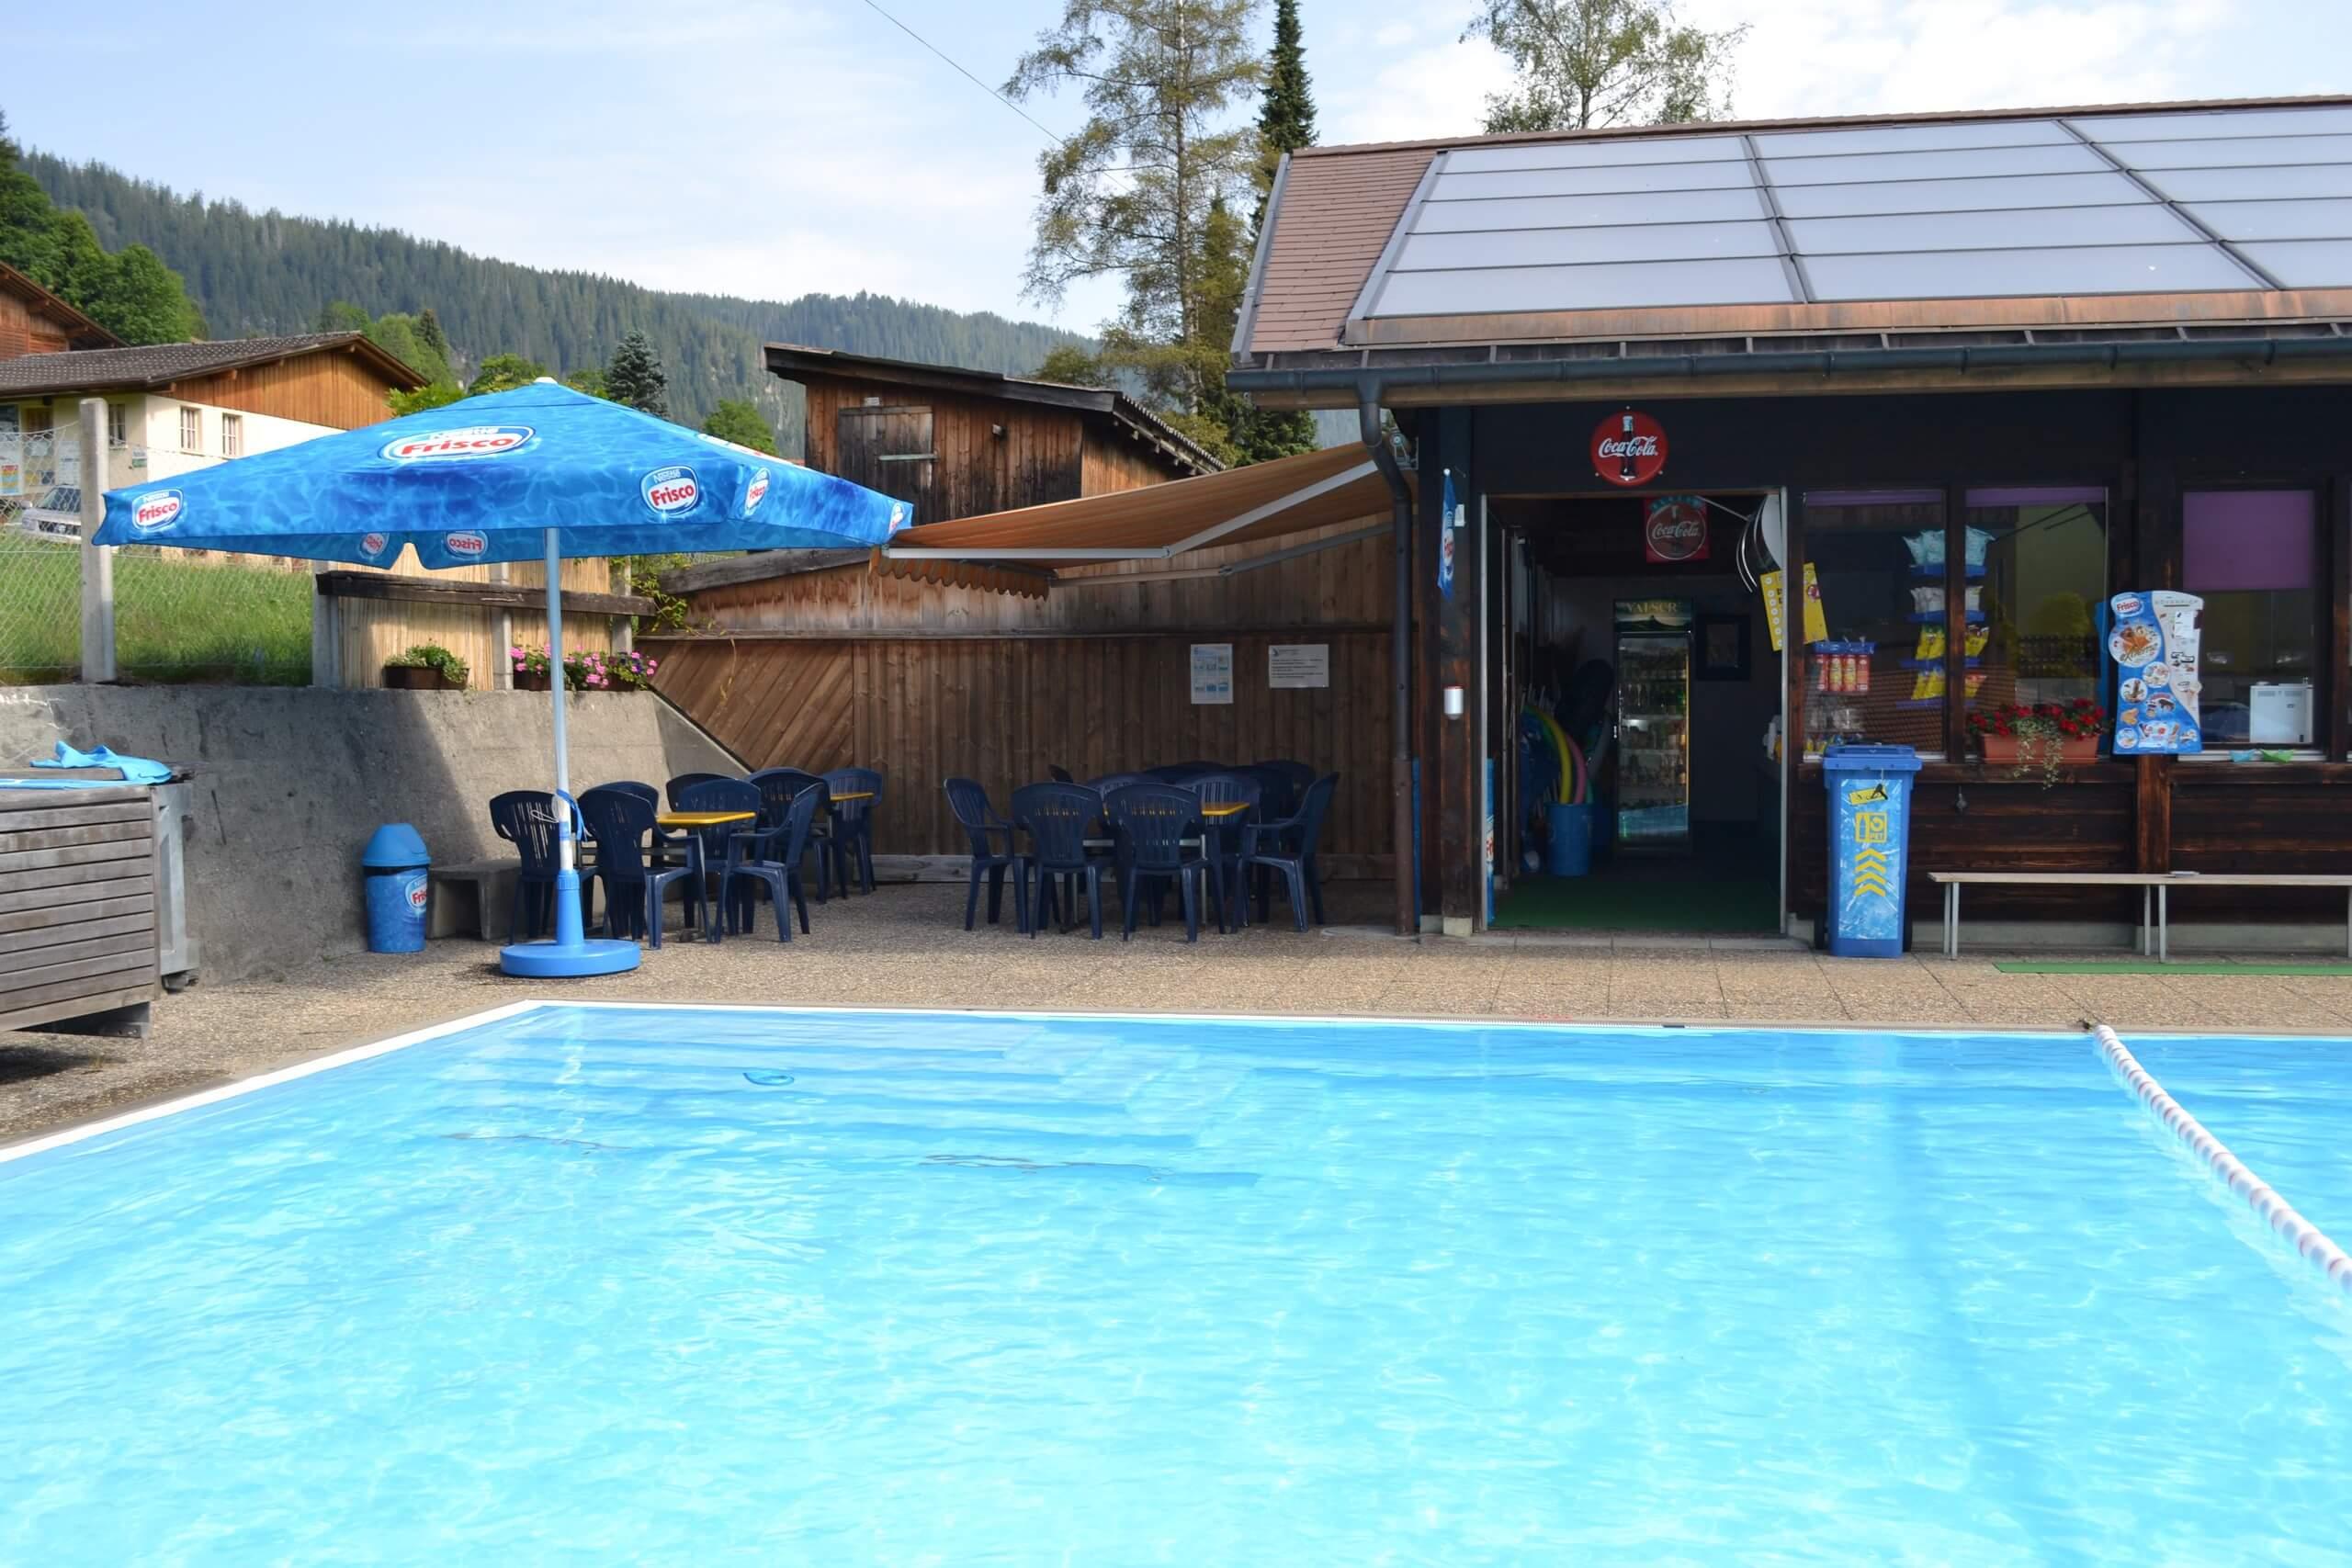 habkern-schwimmbad-freiluft-sommer-kiosk